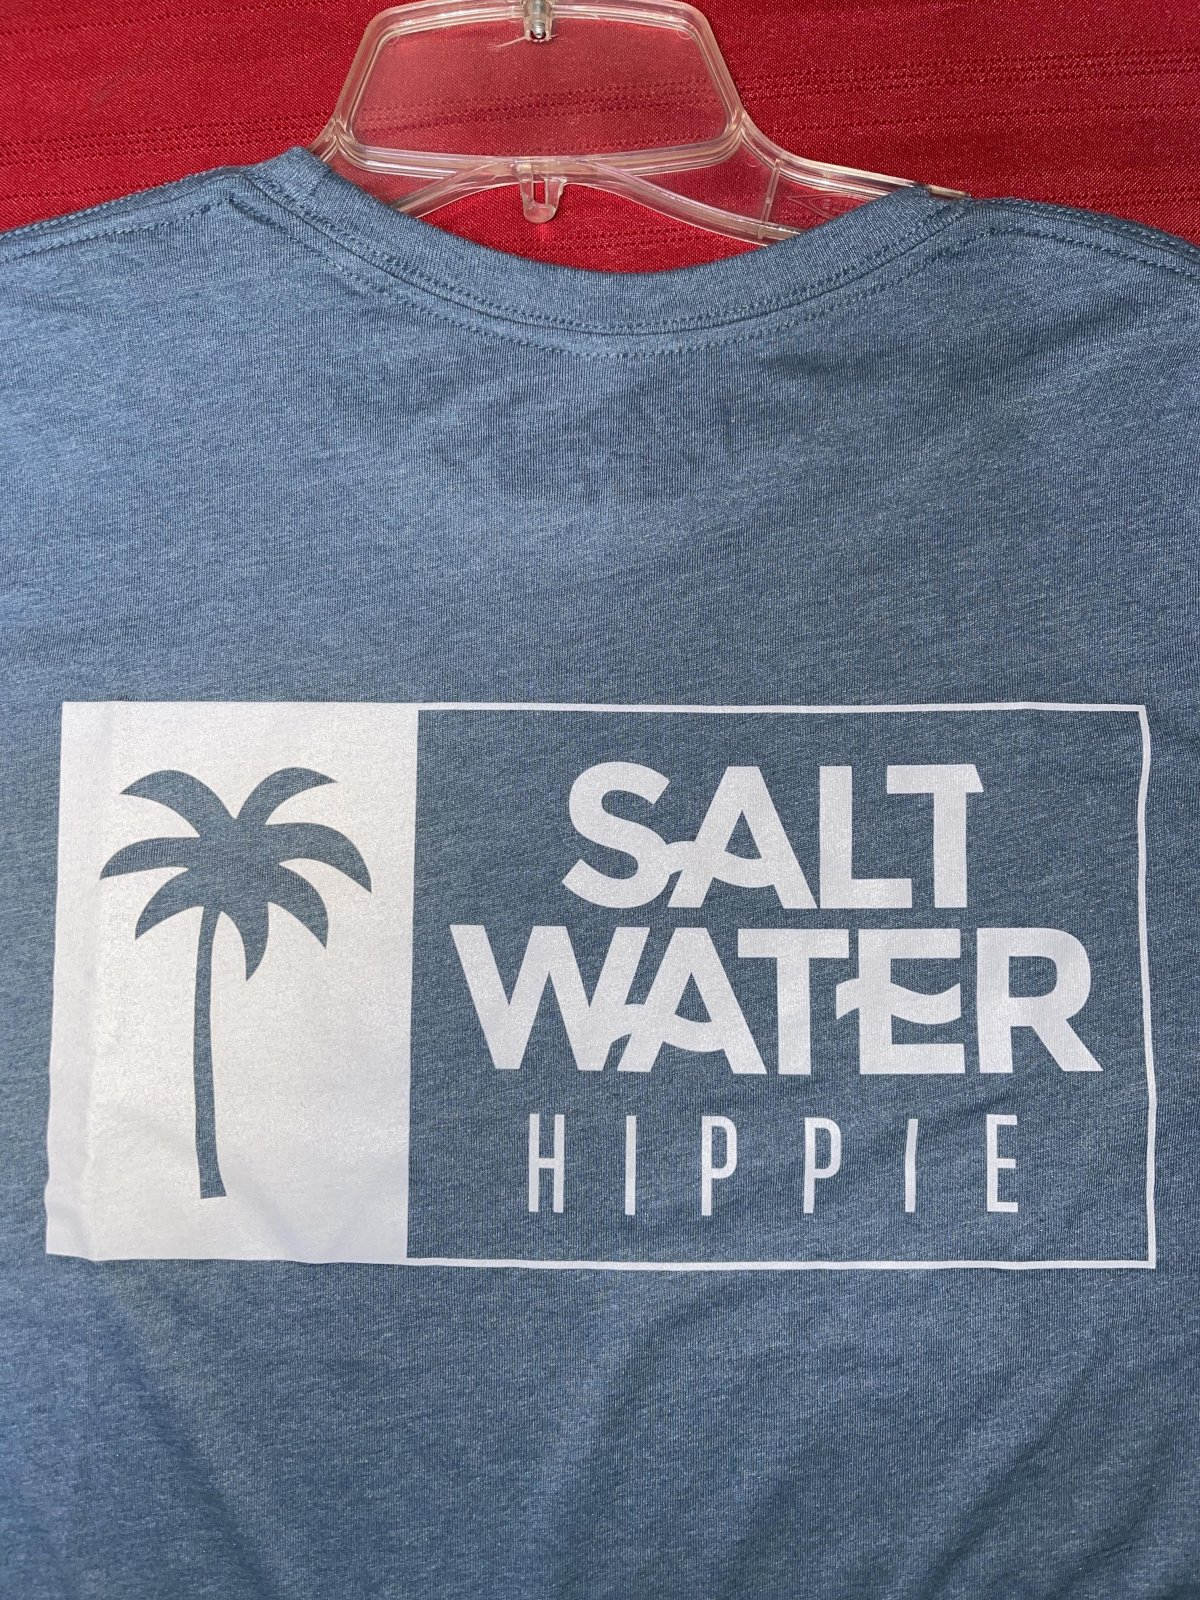 Saltwater Hippie Square Back Logo Long Sleeve T-Shirt